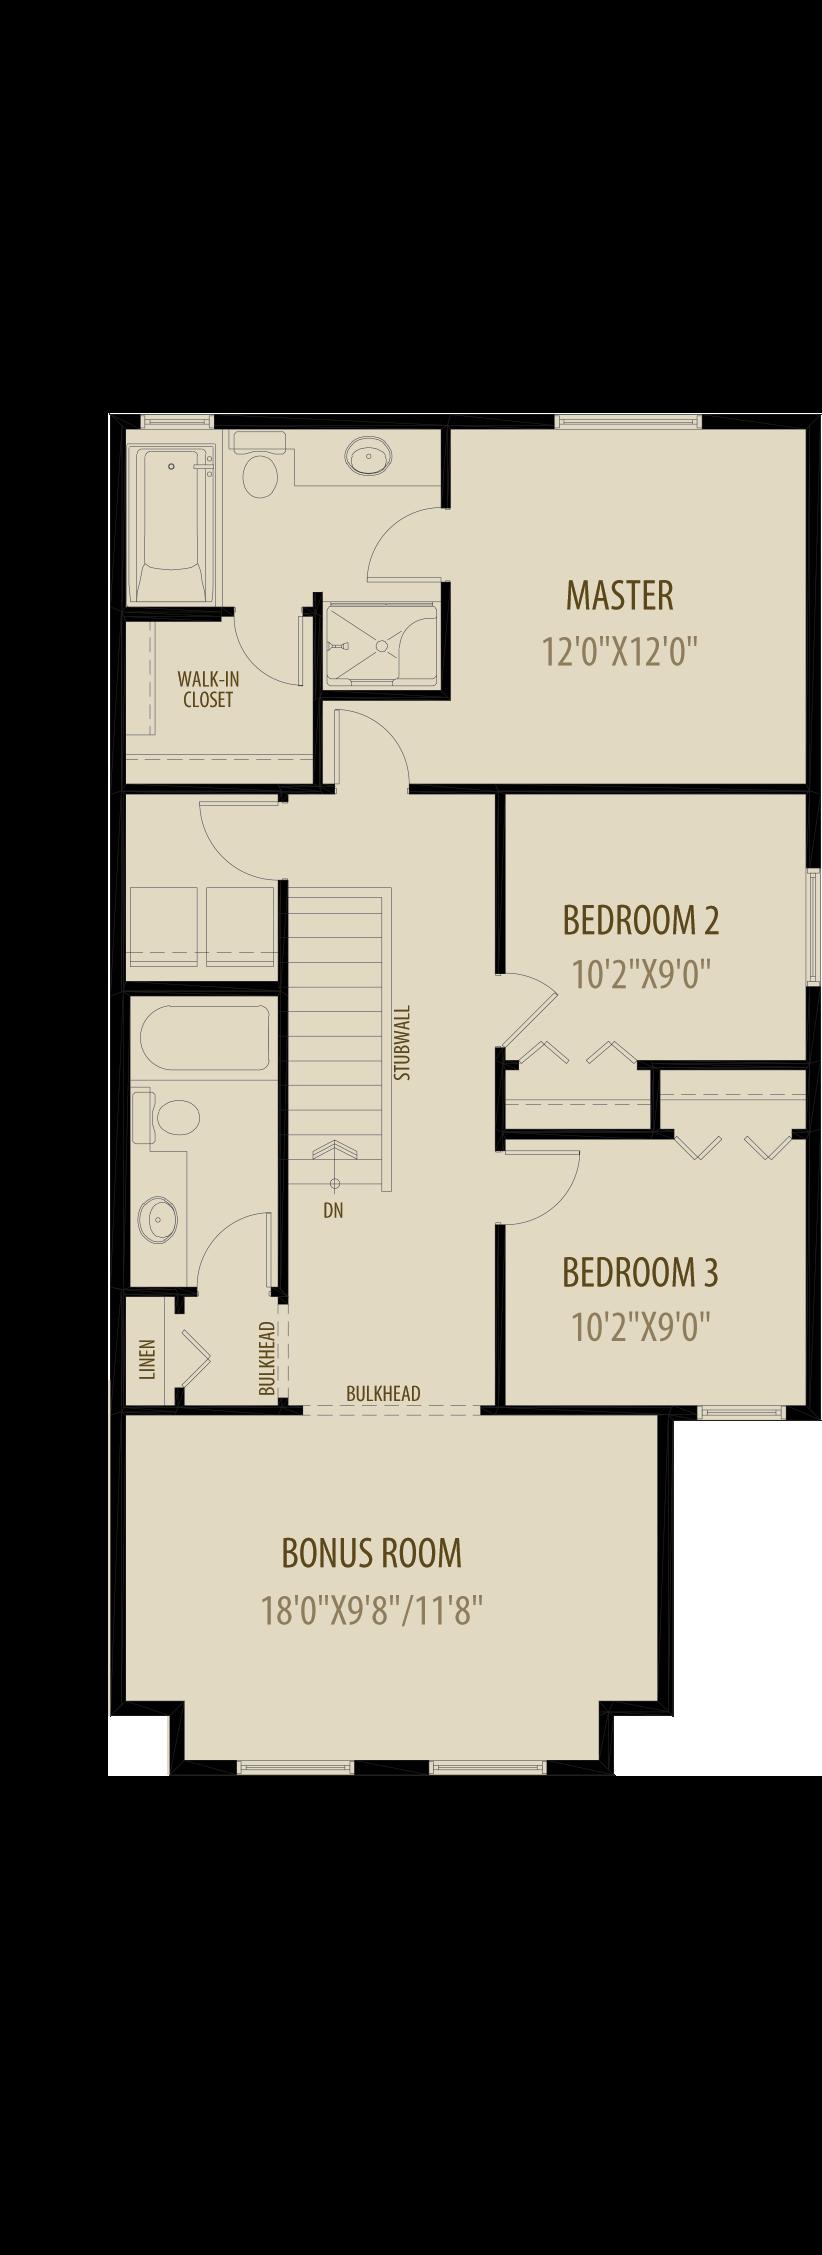 Option 2 Revised Upper Floor Adds 58Sq Ft